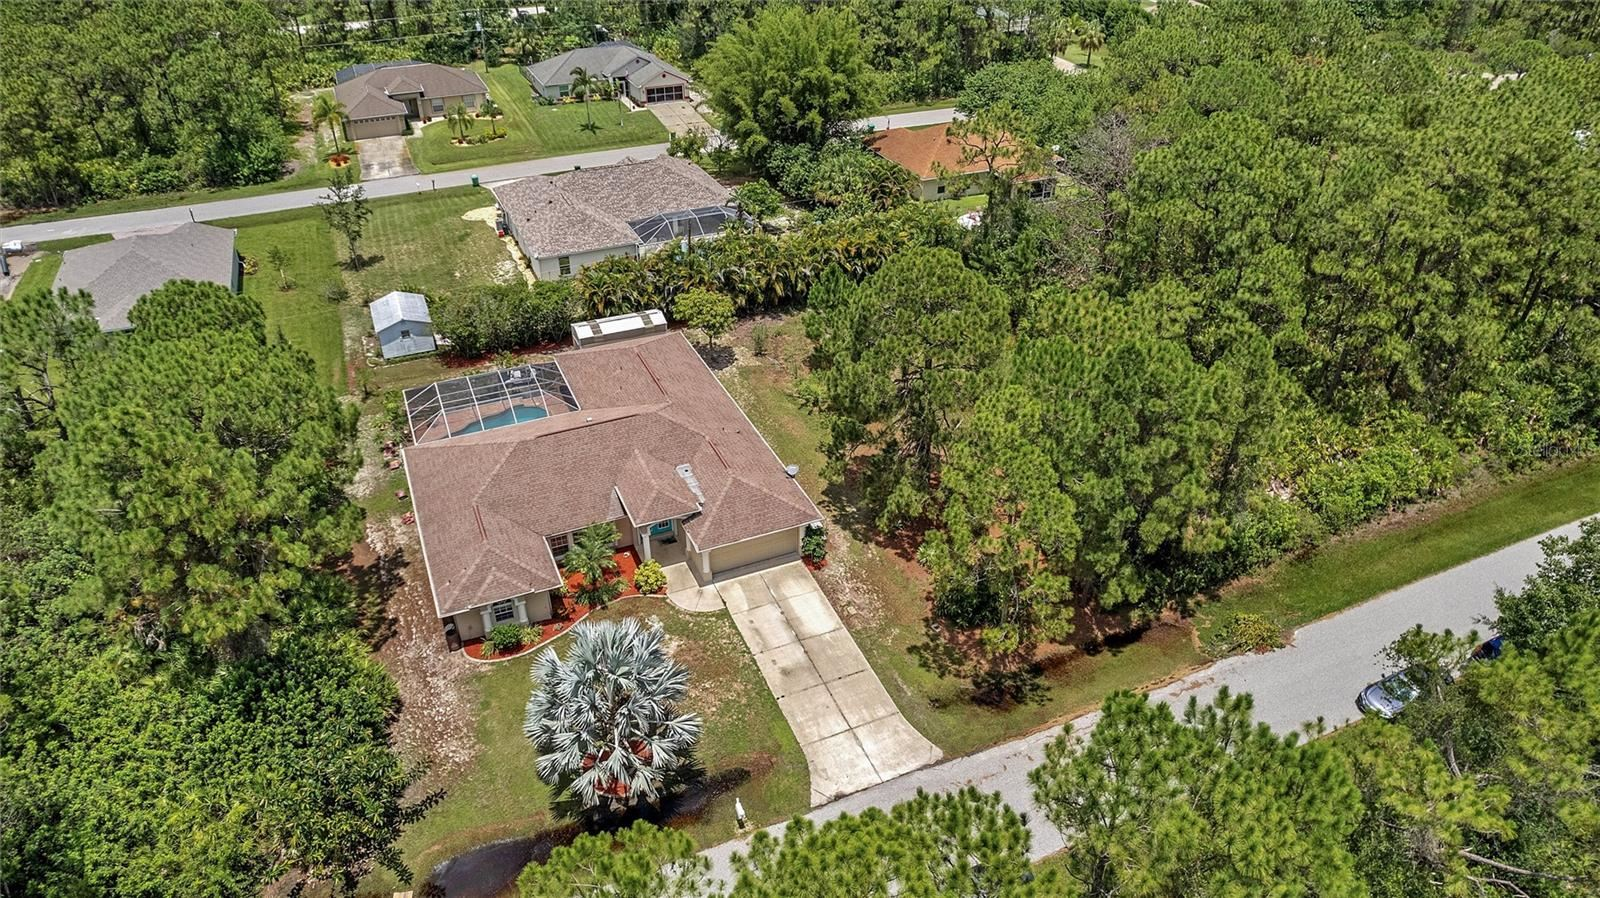 Photo of 5273 CRESTLINE TERRACE, PORT CHARLOTTE, FL 33981 (MLS # T3318306)